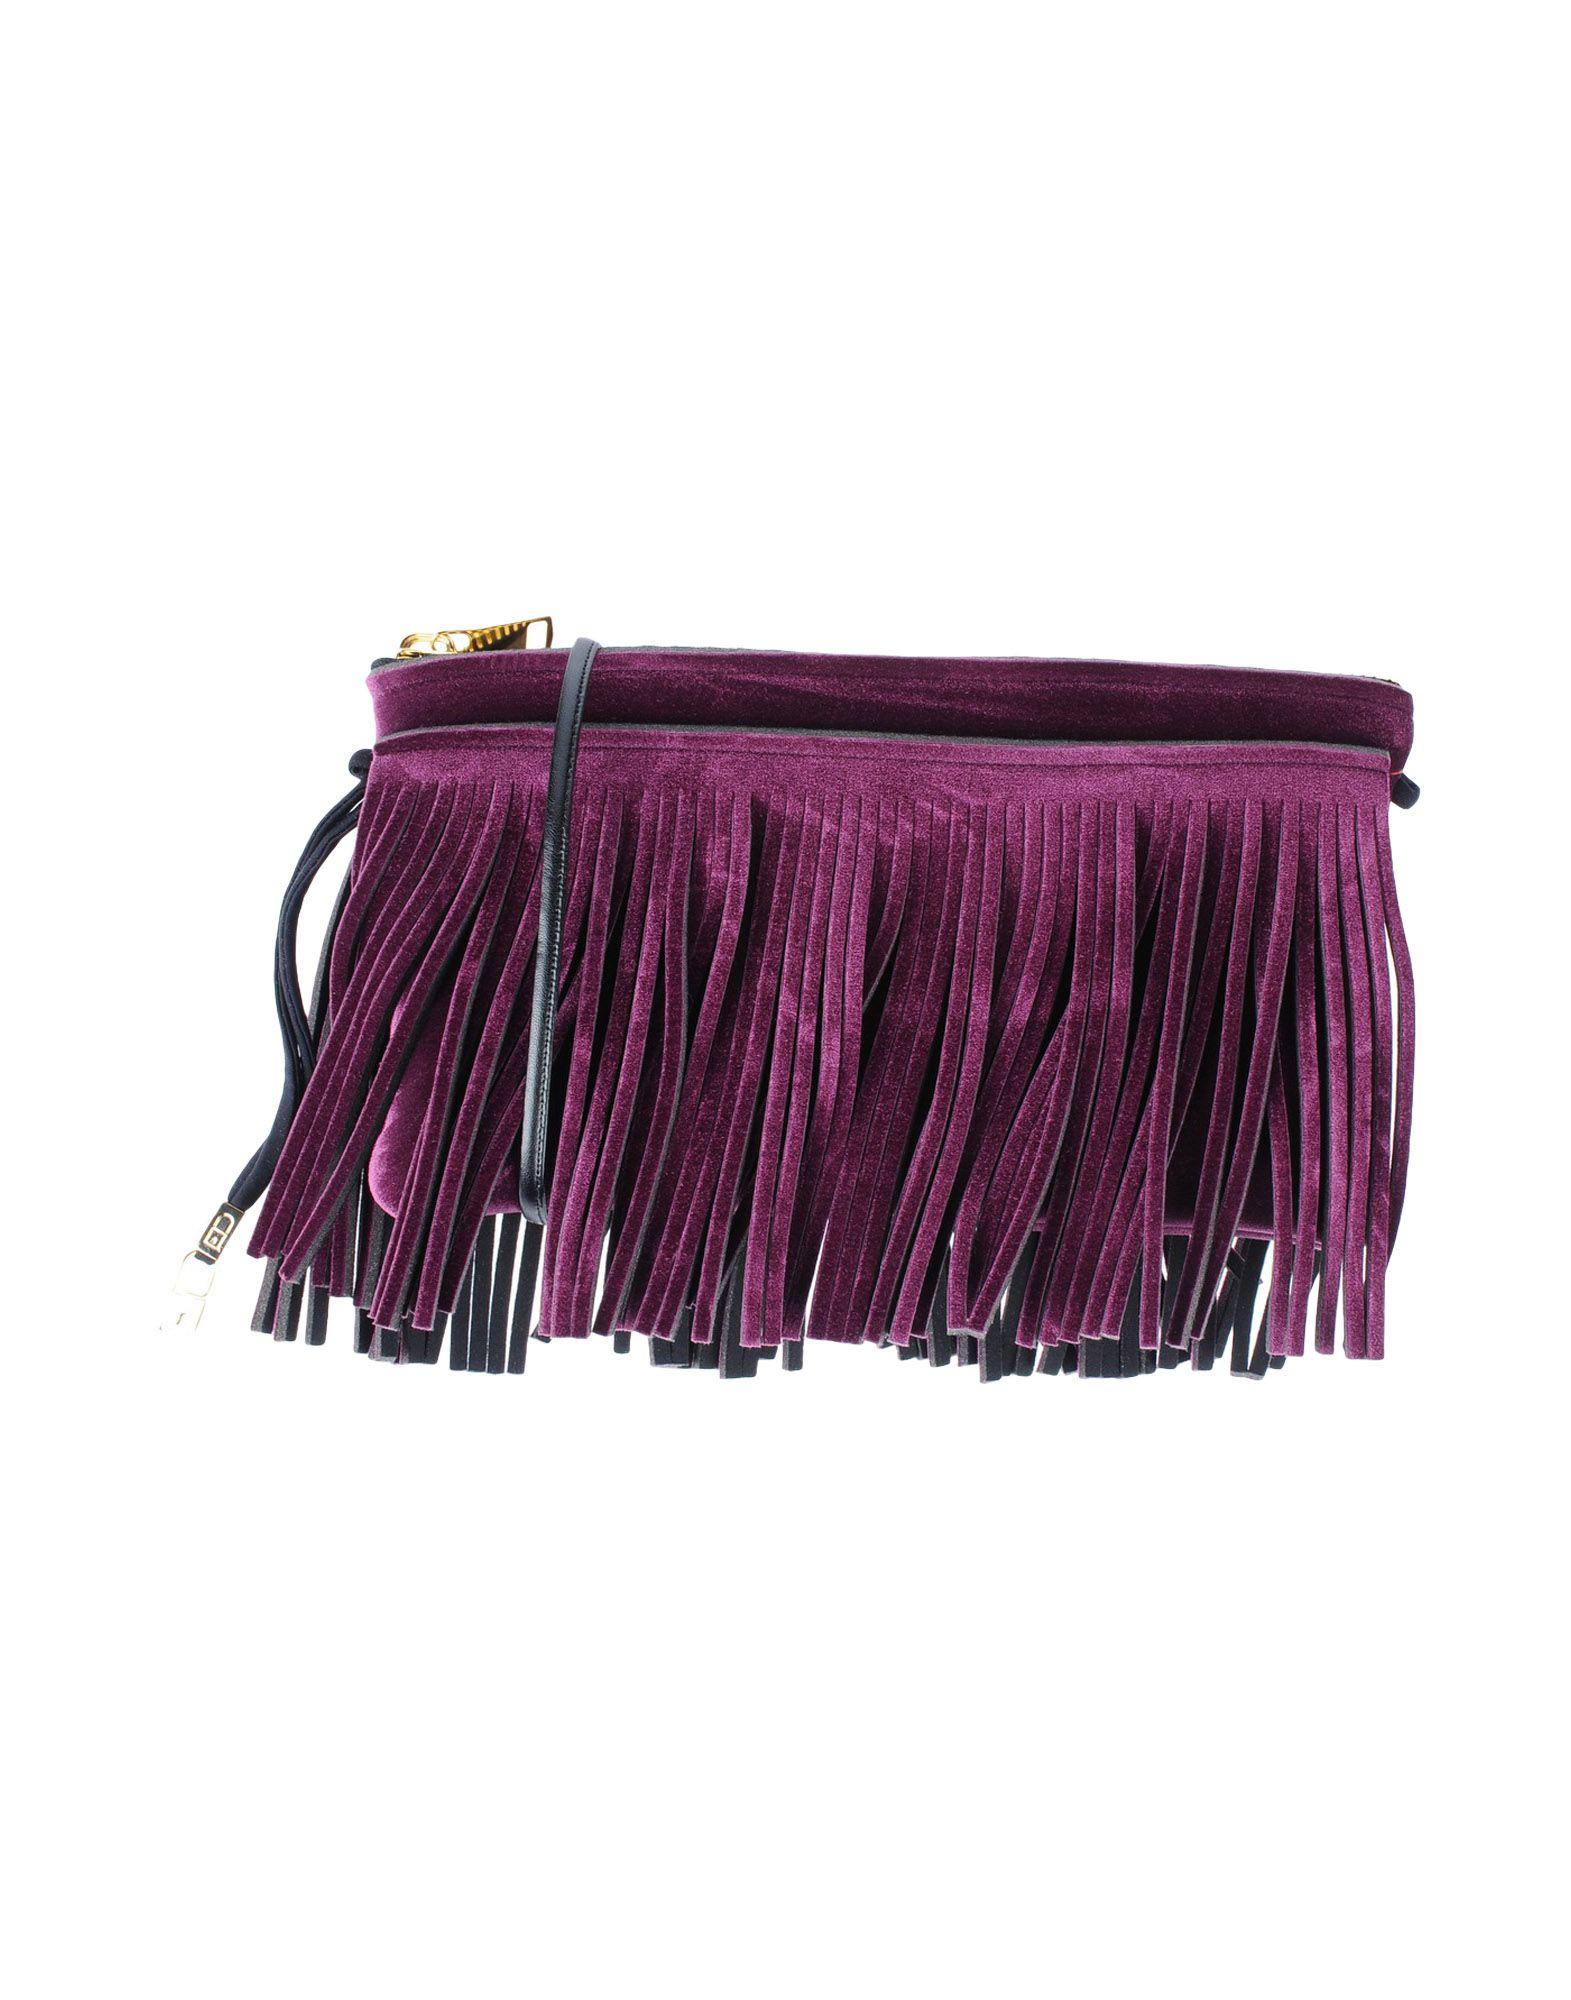 SAVE MY BAG Сумка через плечо сумка через плечо women leather handbag messenger bags 2014 new shoulder bag ls5520 women leather handbag messenger bags 2015 new shoulder bag